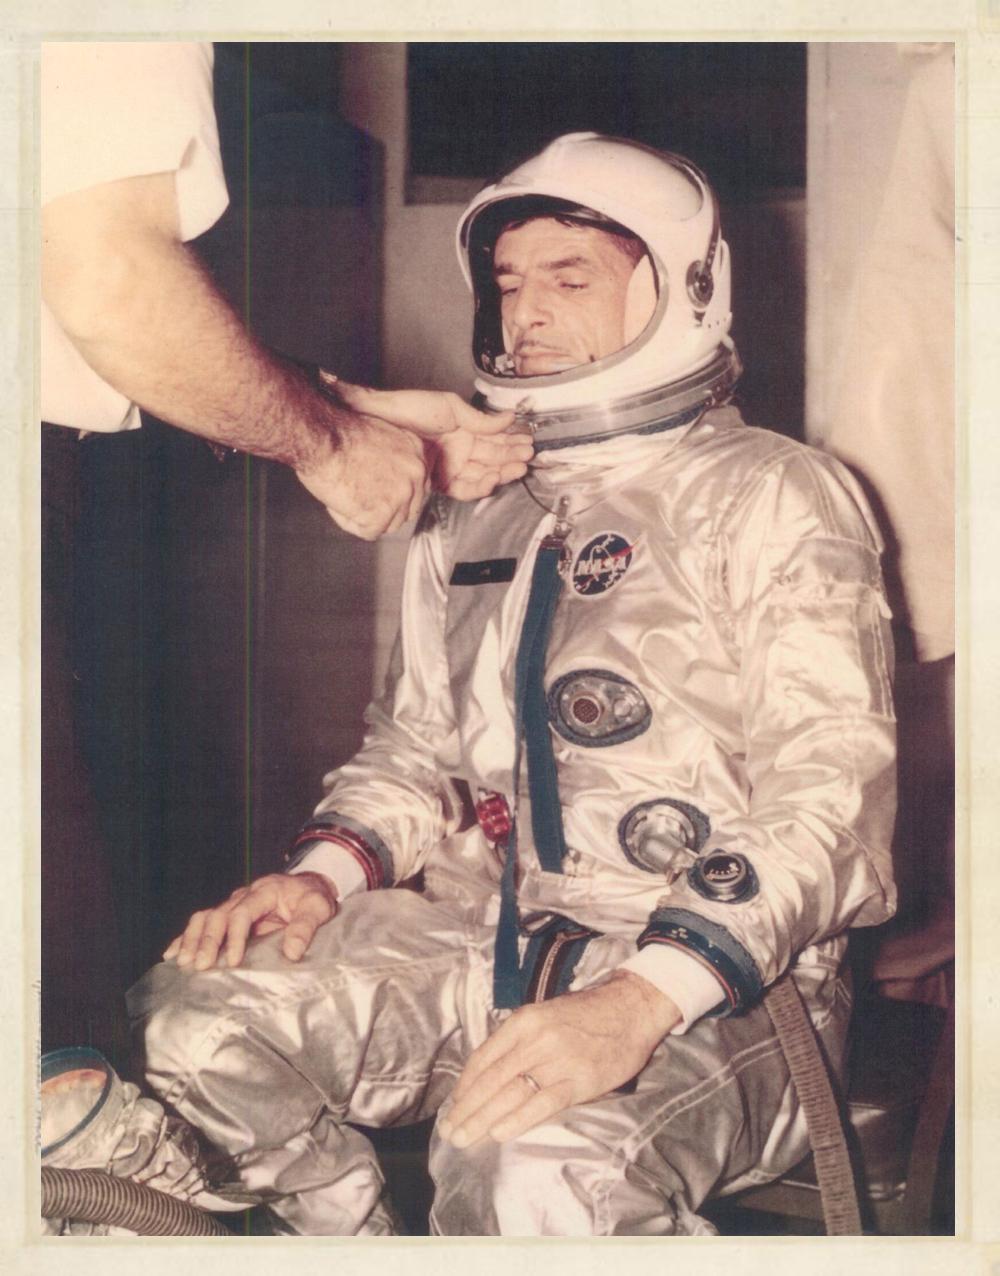 Astronaut copy.jpg